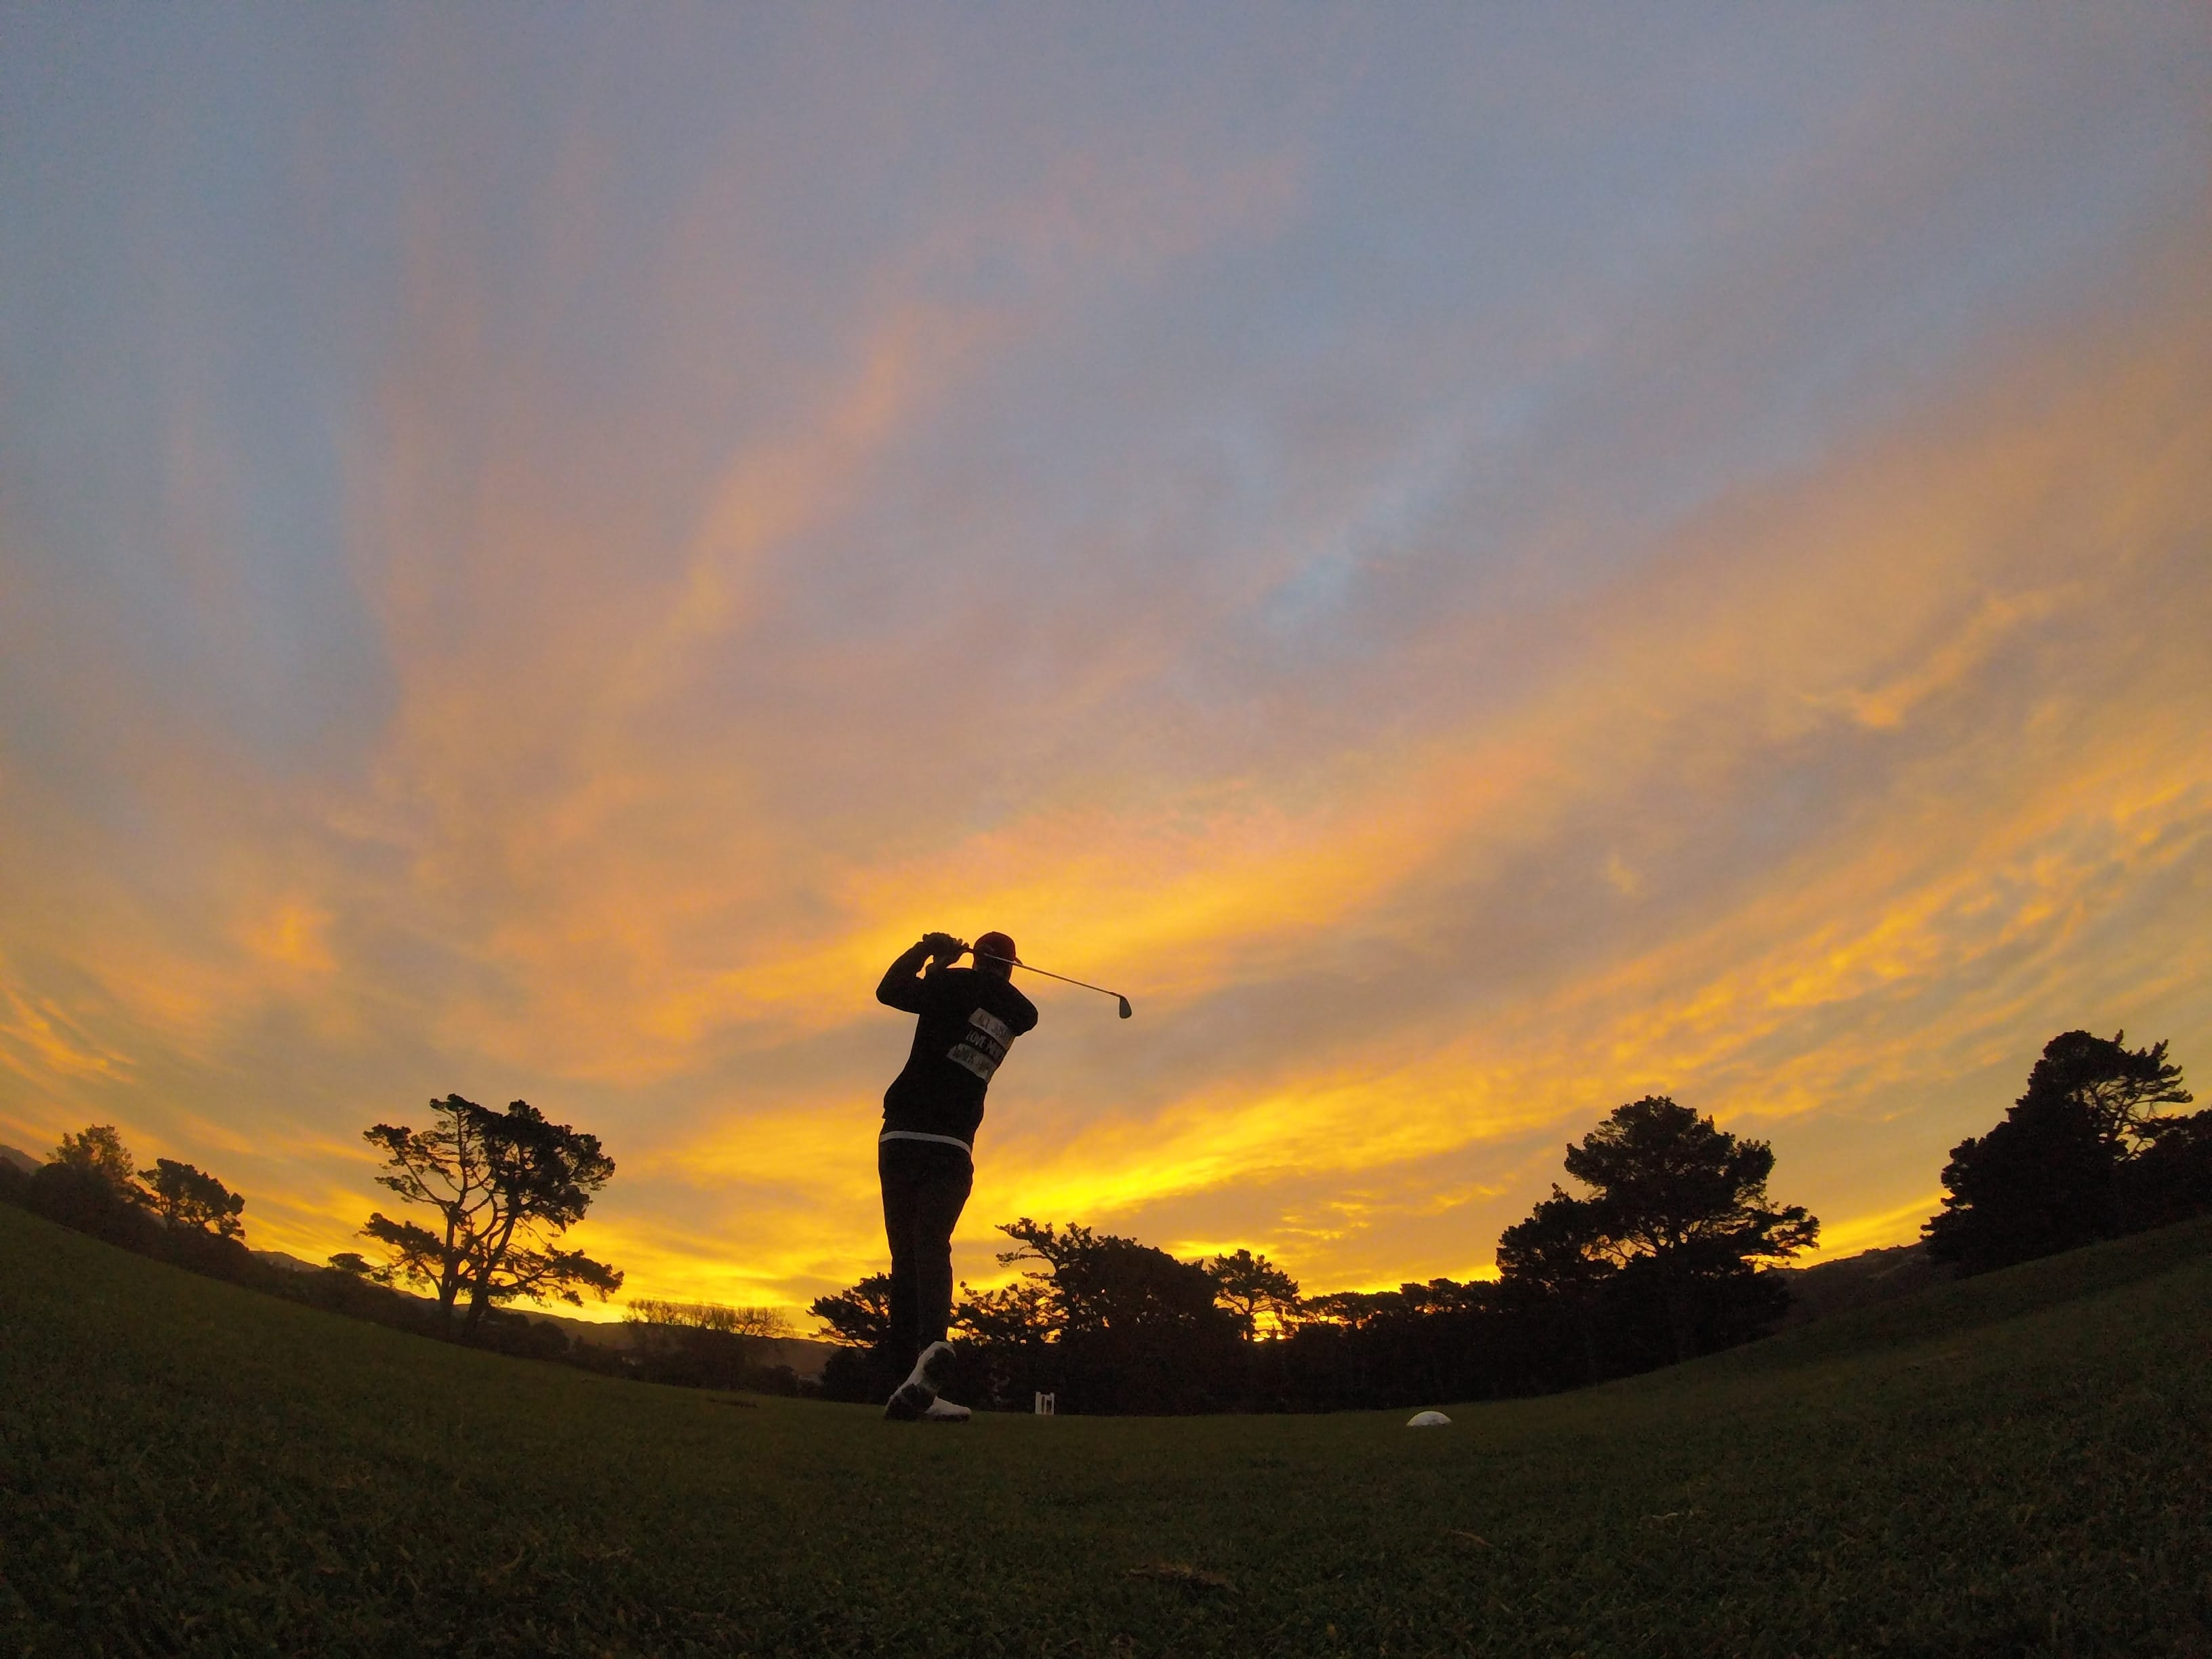 Silhouette of man swinging golf club at sunset; image by David Goldsbury, via Unsplash.com.